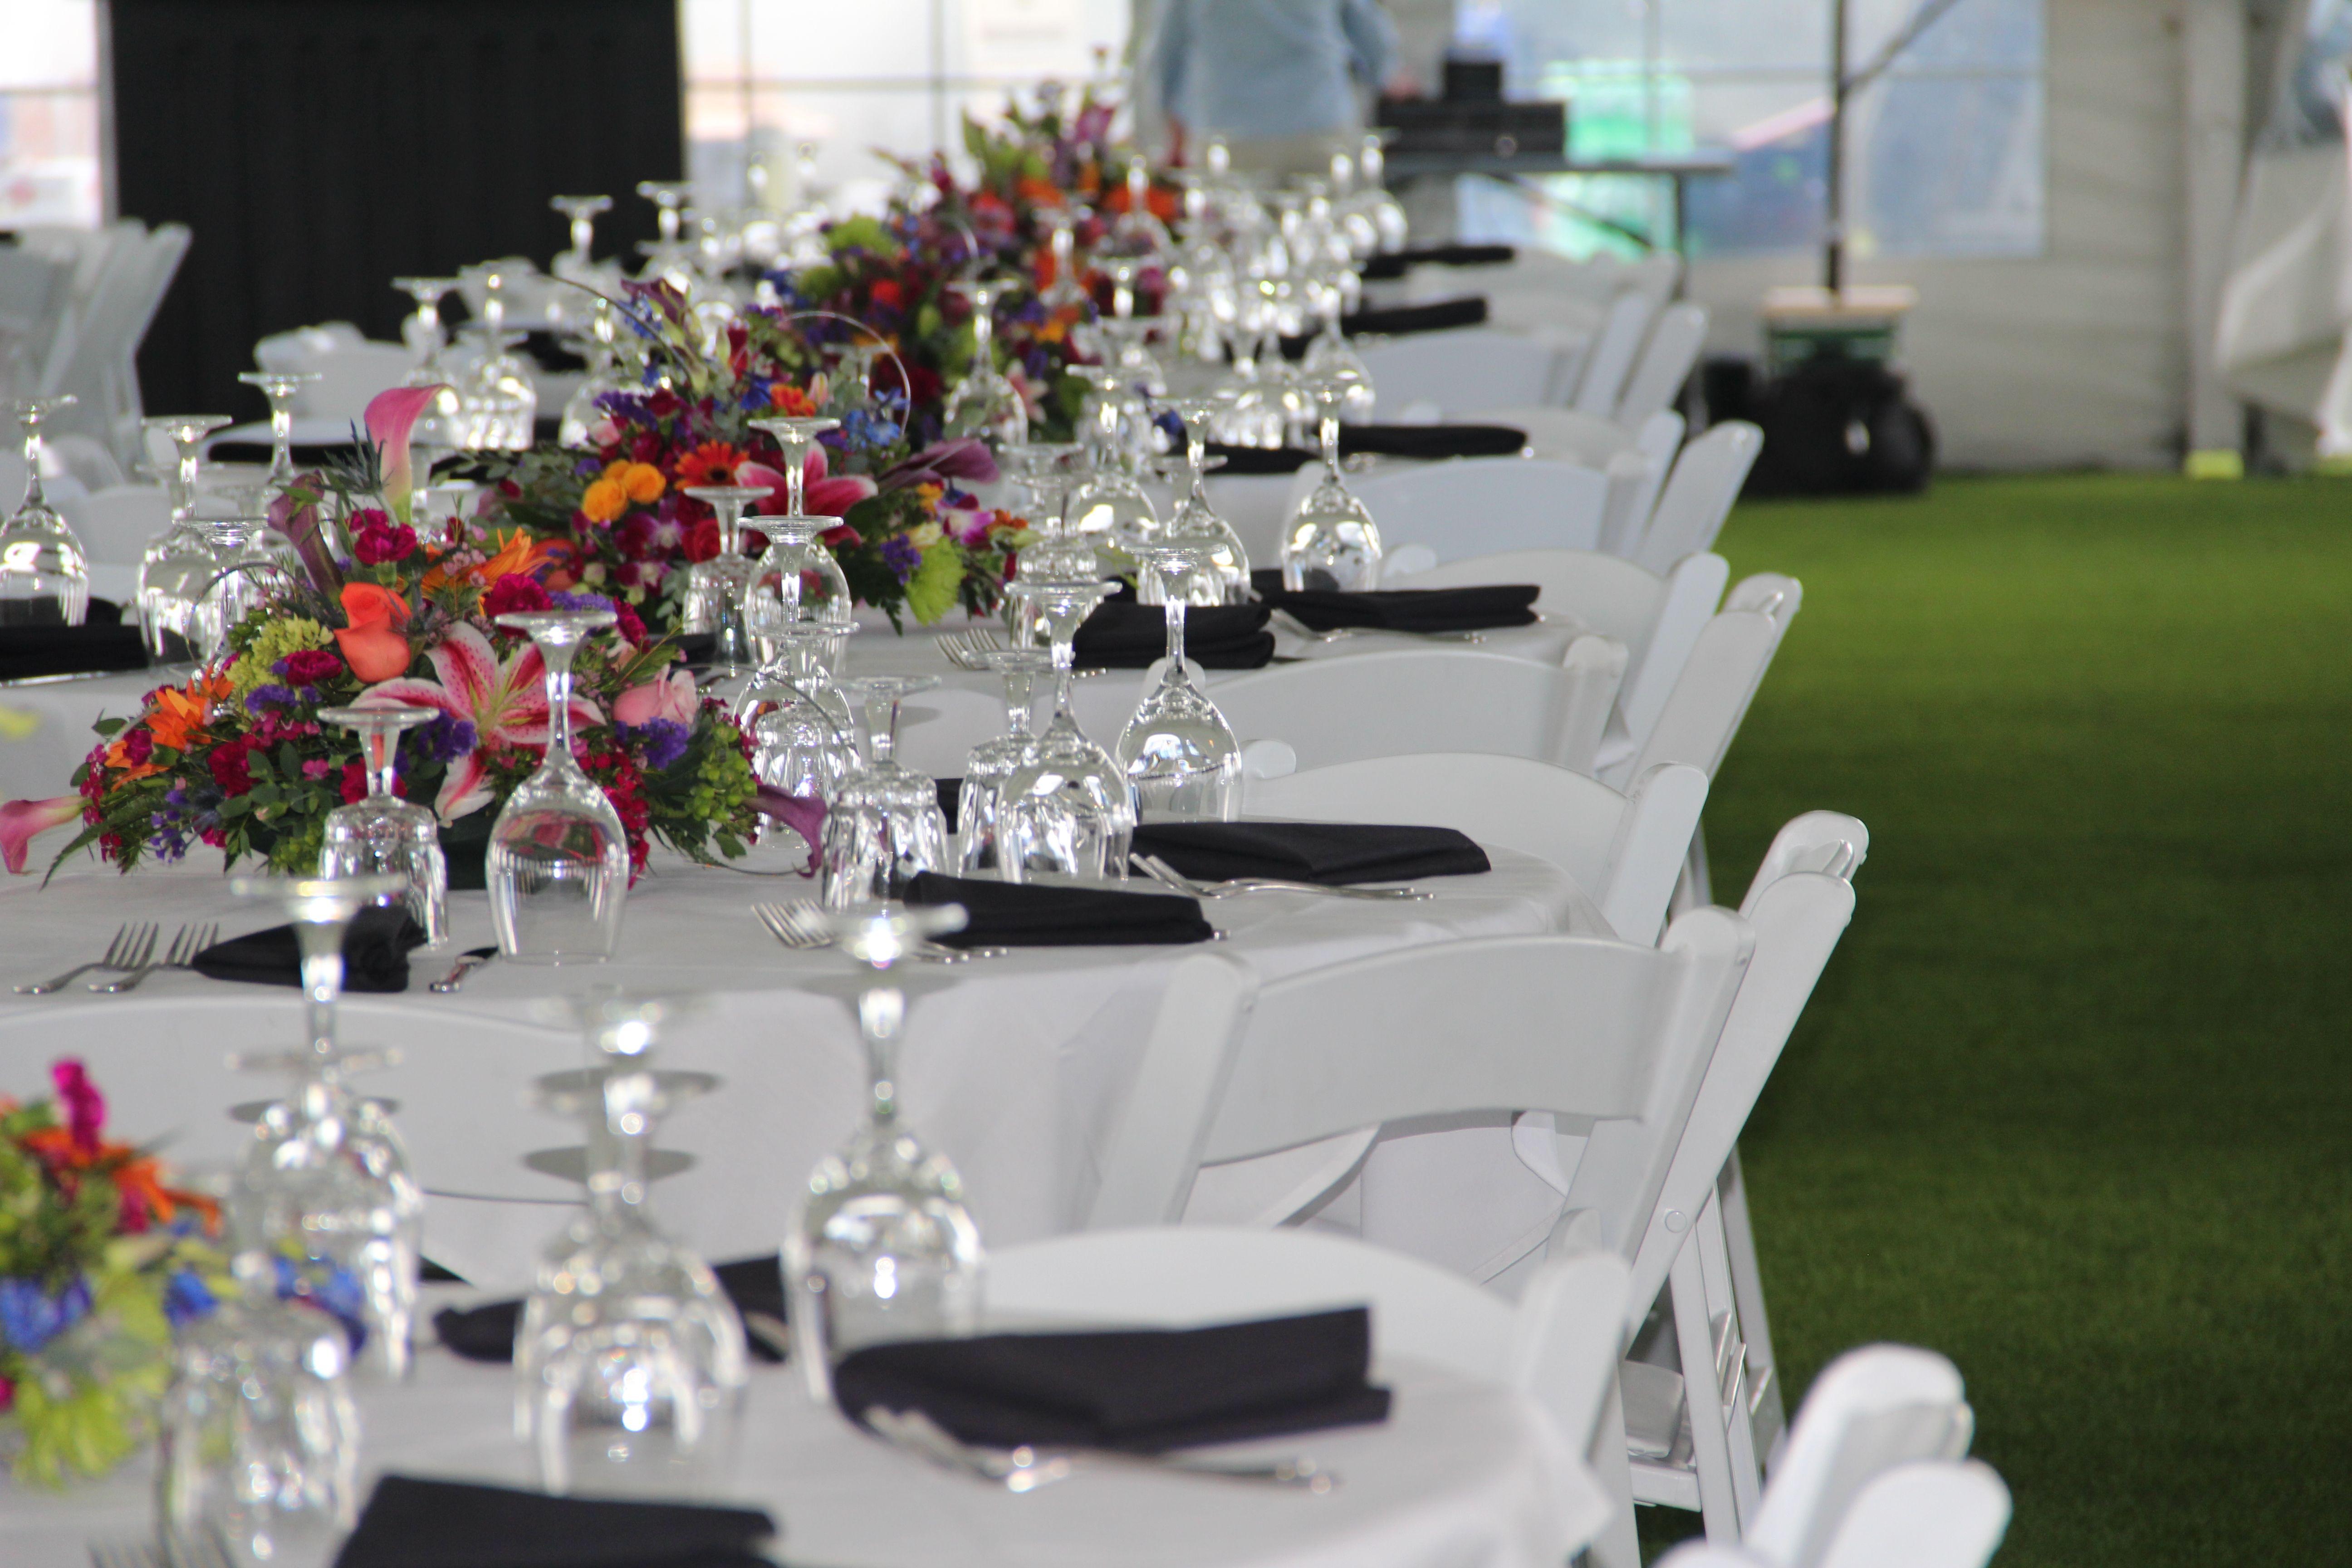 Beautiful event set up at Three Crowns Golf Club in Casper